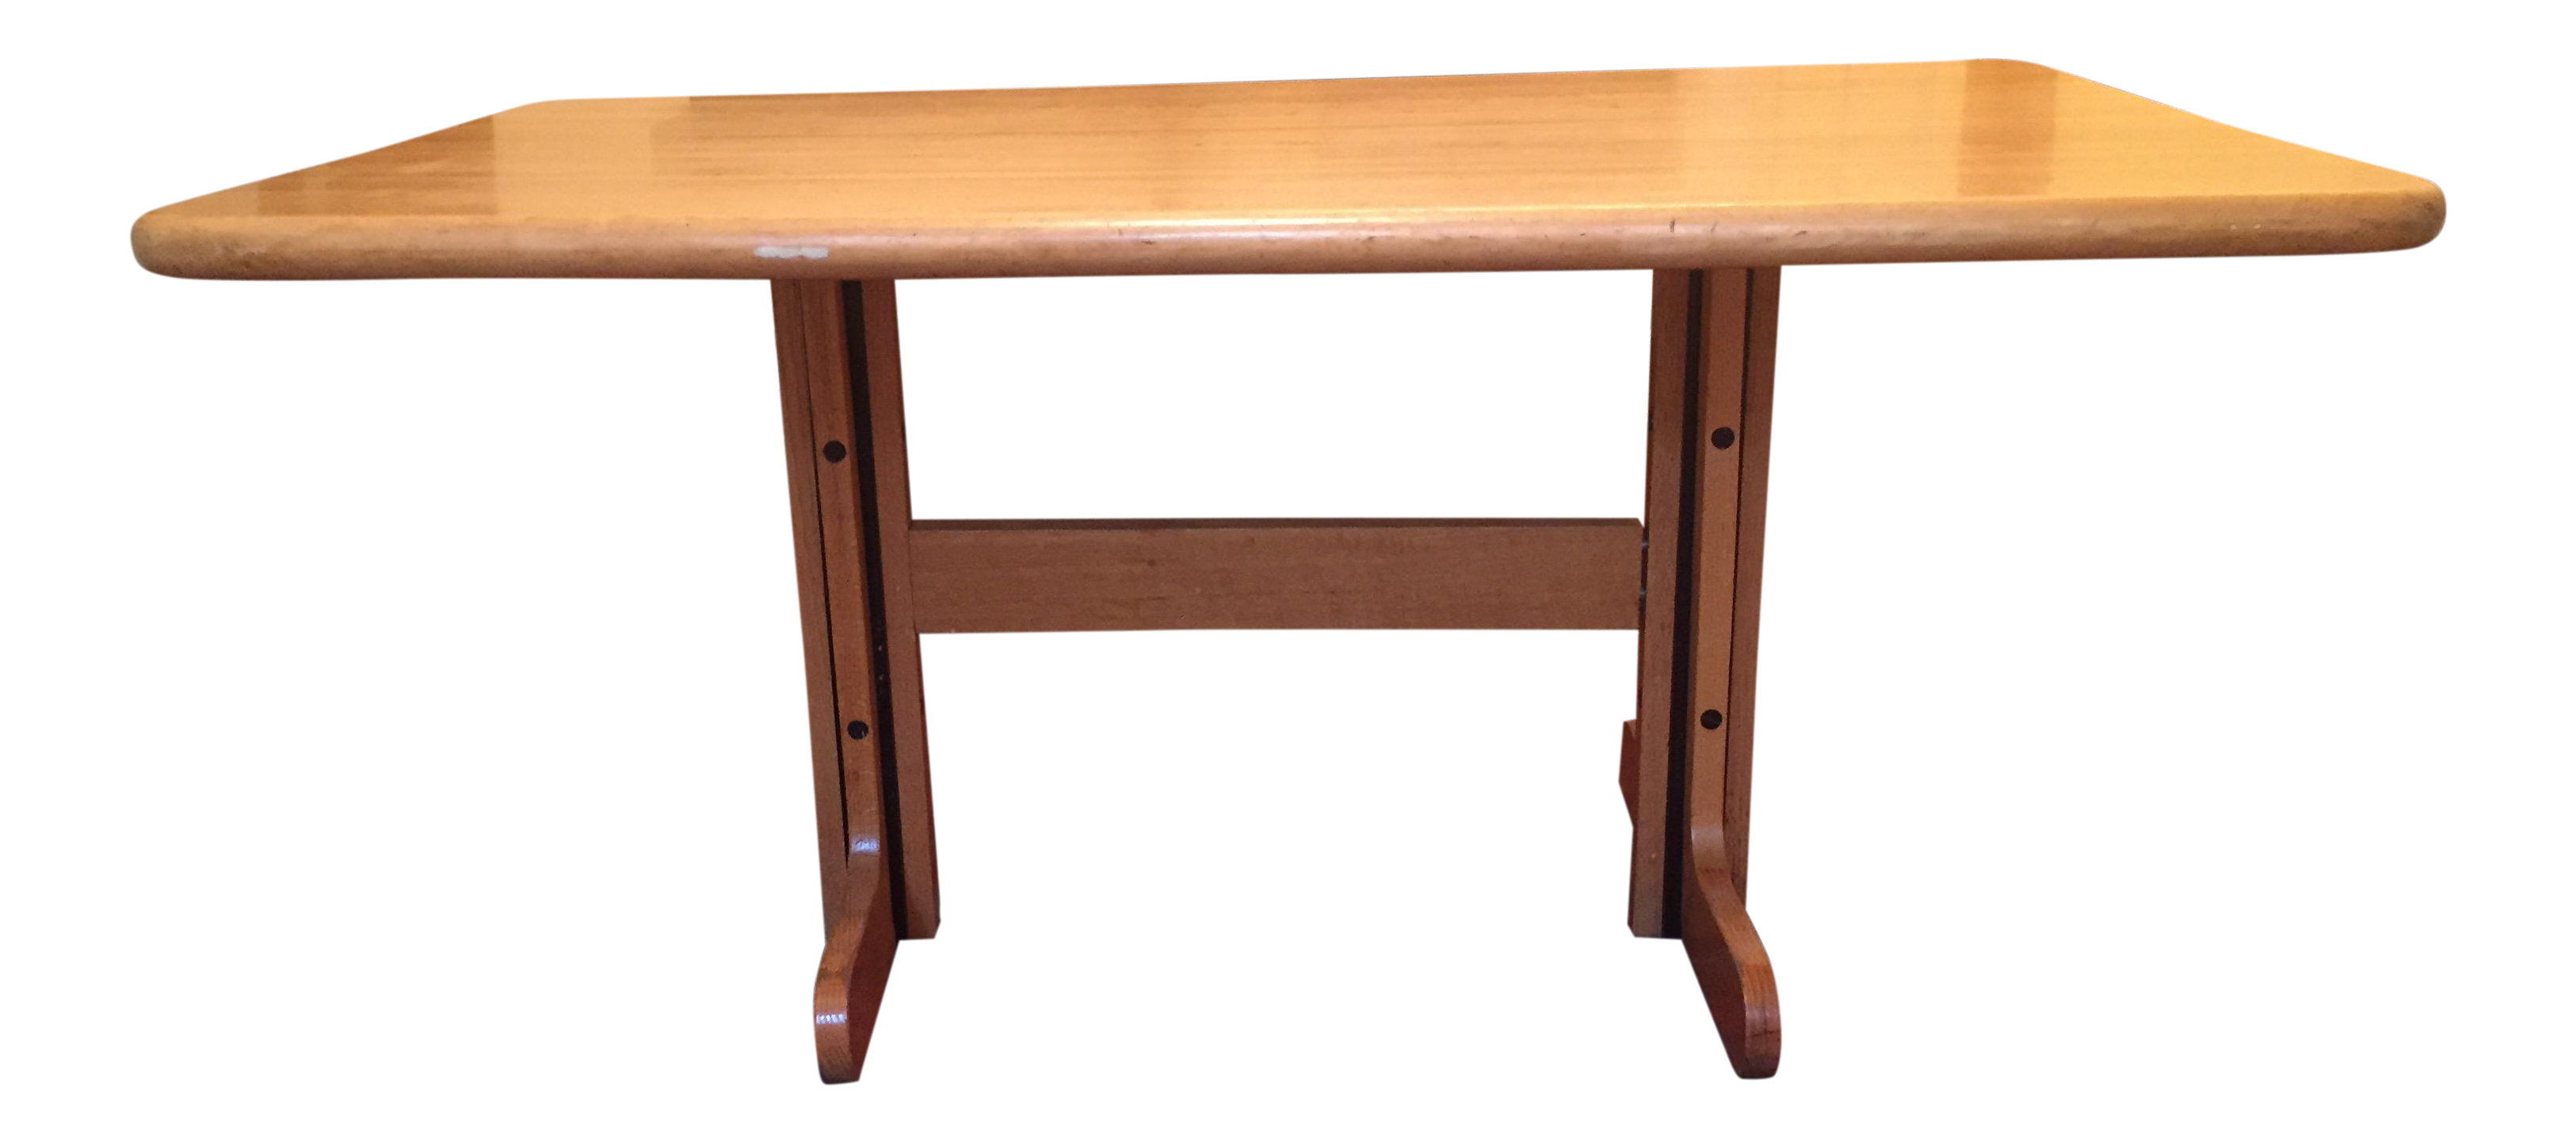 Solid Maple Kitchen Table | Maple kitchen, Butcher blocks and Kitchens